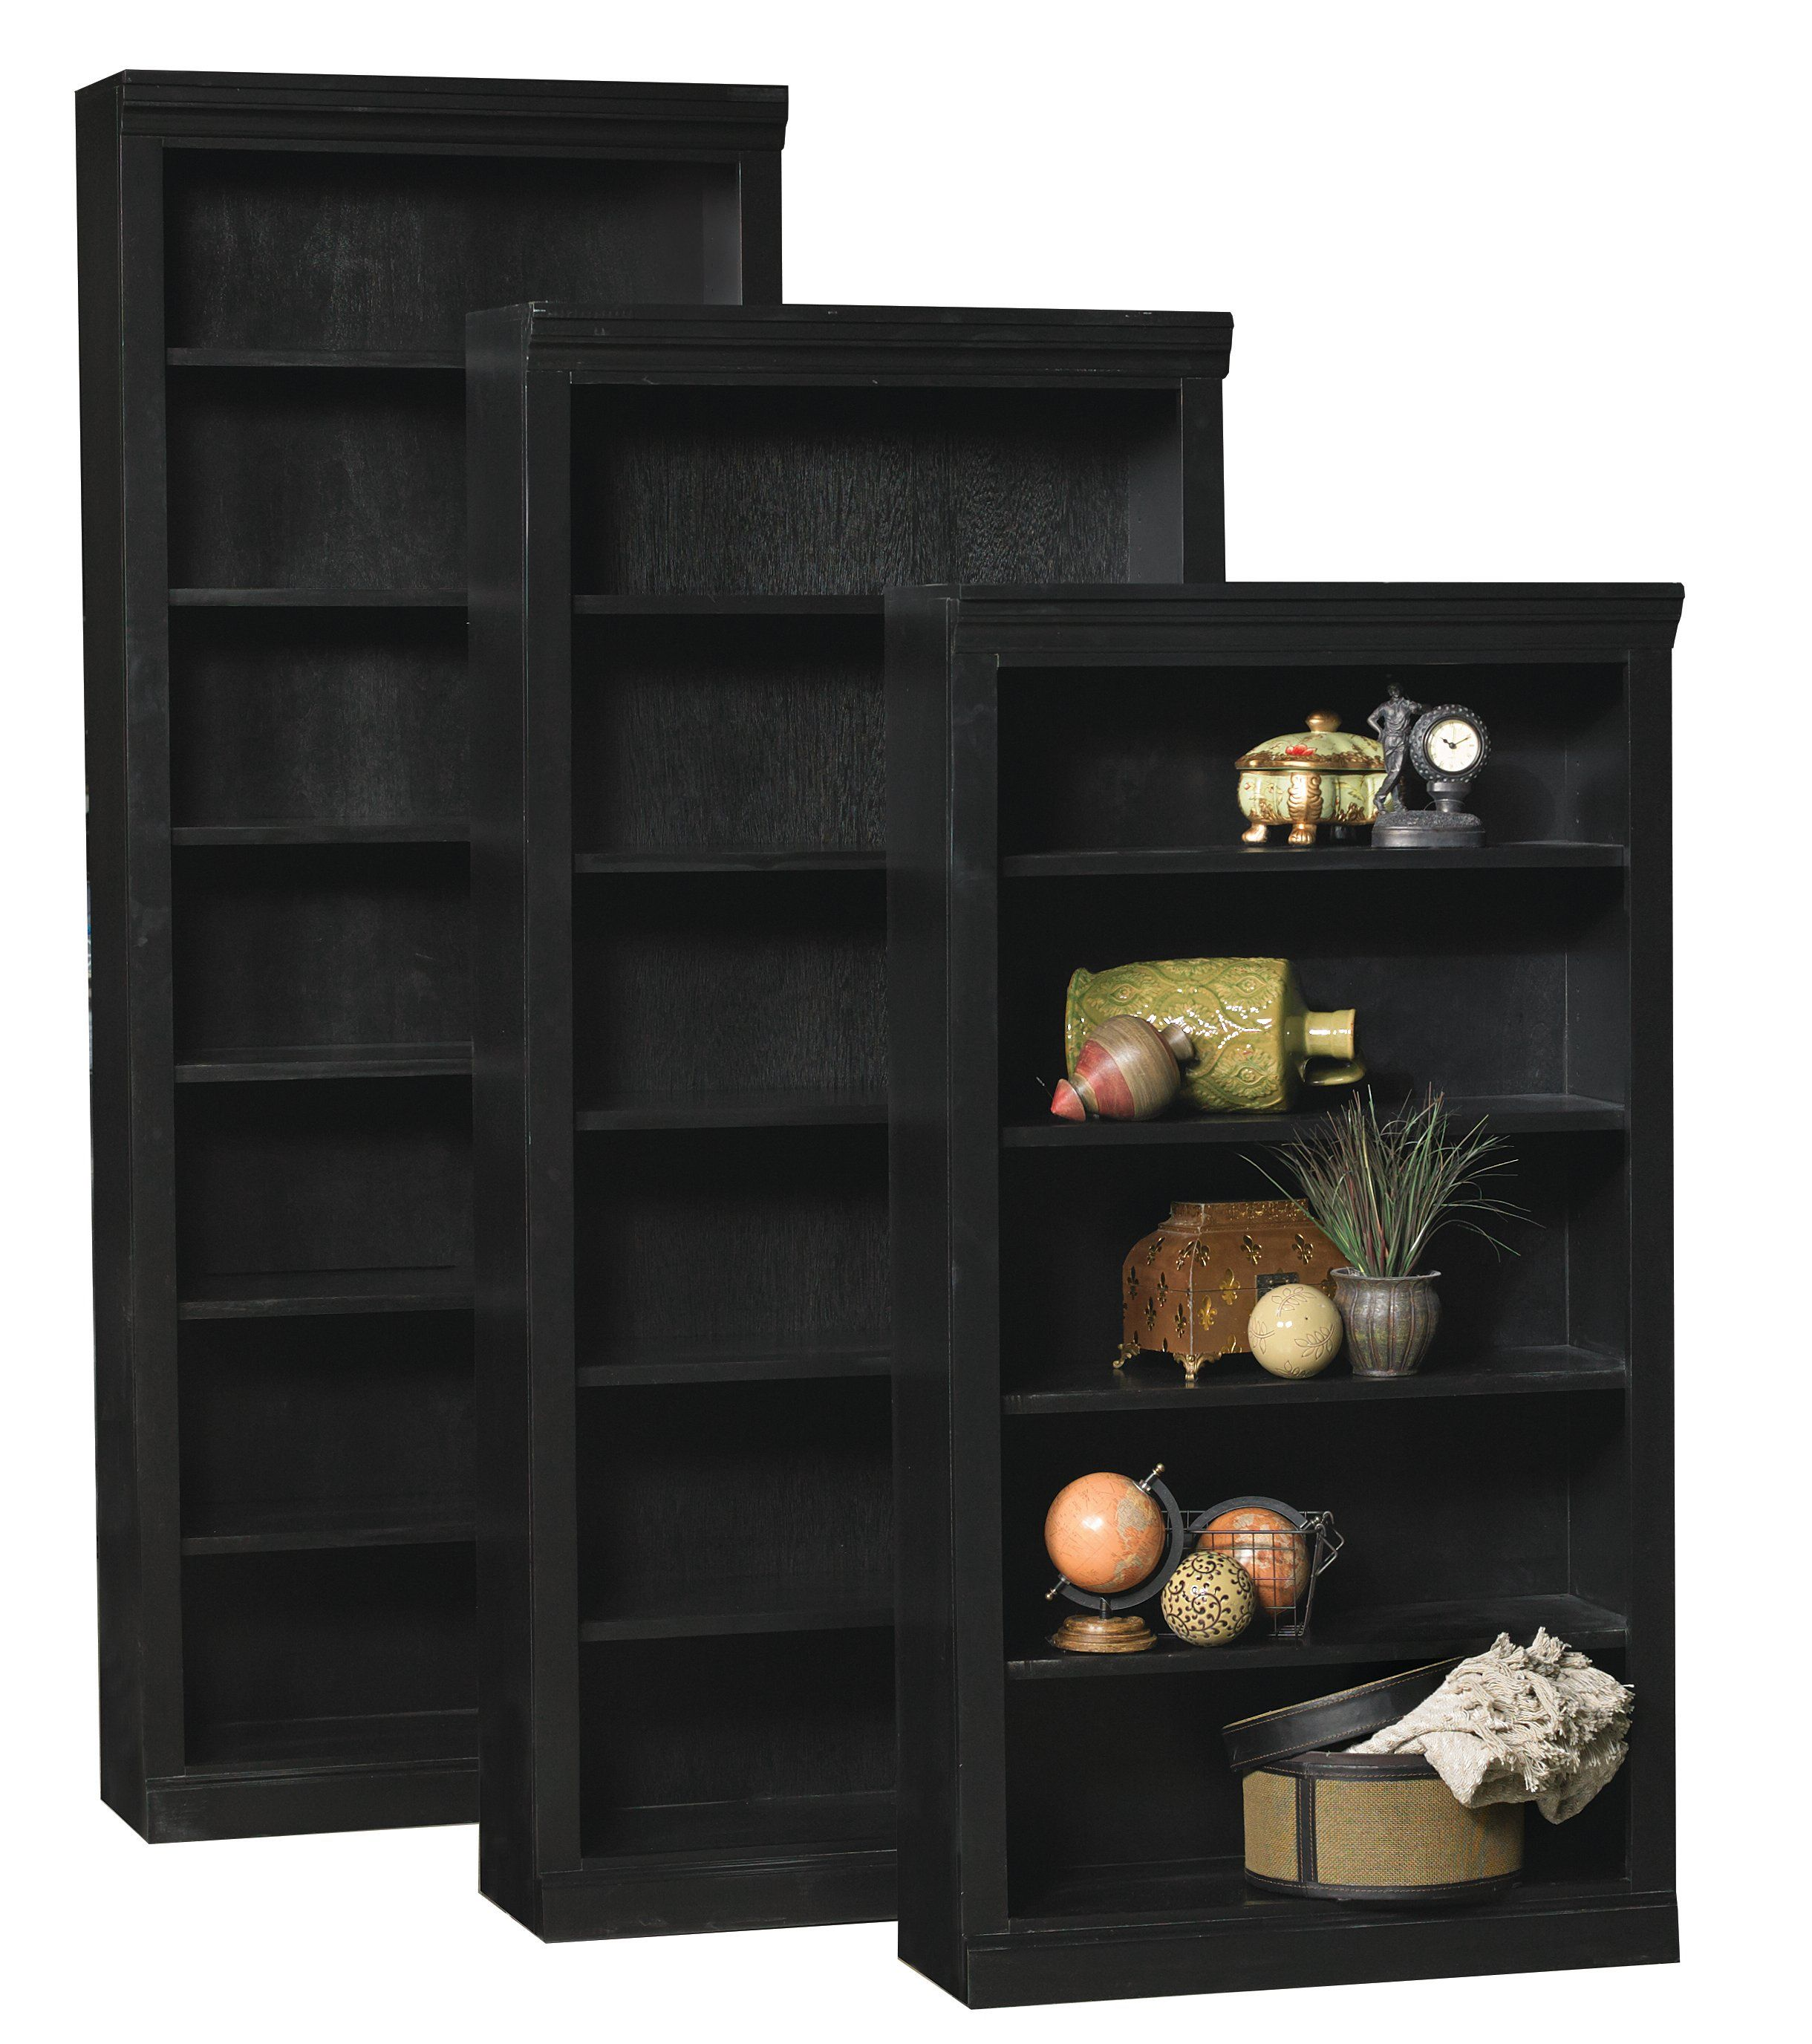 60 Inch Modern Black Bookcase Black Bookcase Black Bookshelf Bookcase